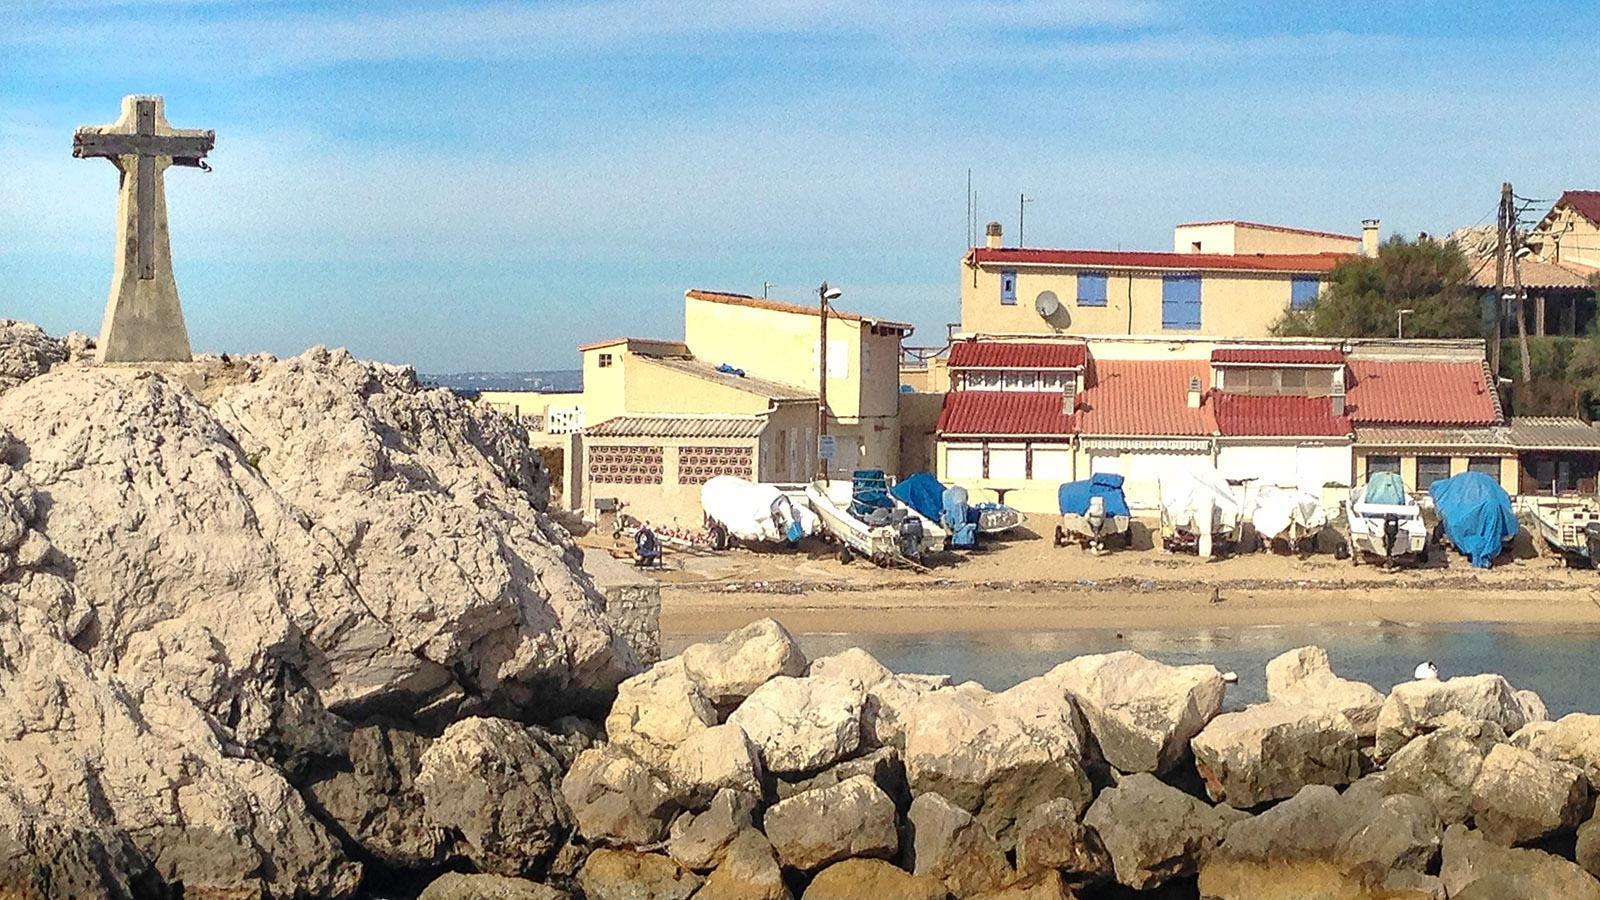 Calanques de Marseille: Das Steinkreuz vom Cap Croisette. Foto: Hilke Maunder